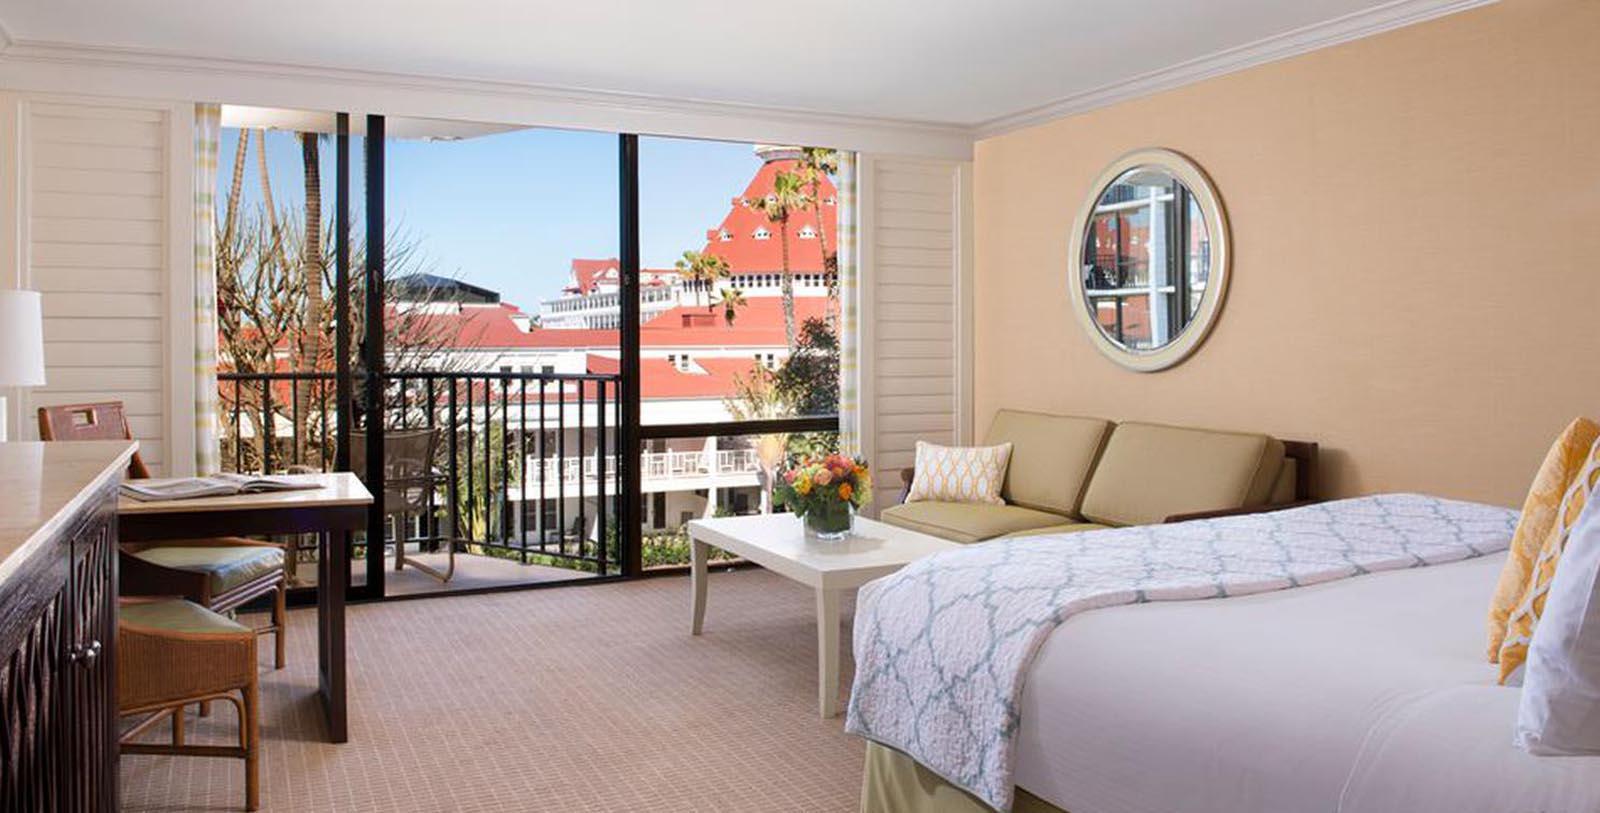 Image of Guestroom Interior, Hotel del Coronado in Coronado, California, 1886, Member of Historic Hotels of America, Accommodations